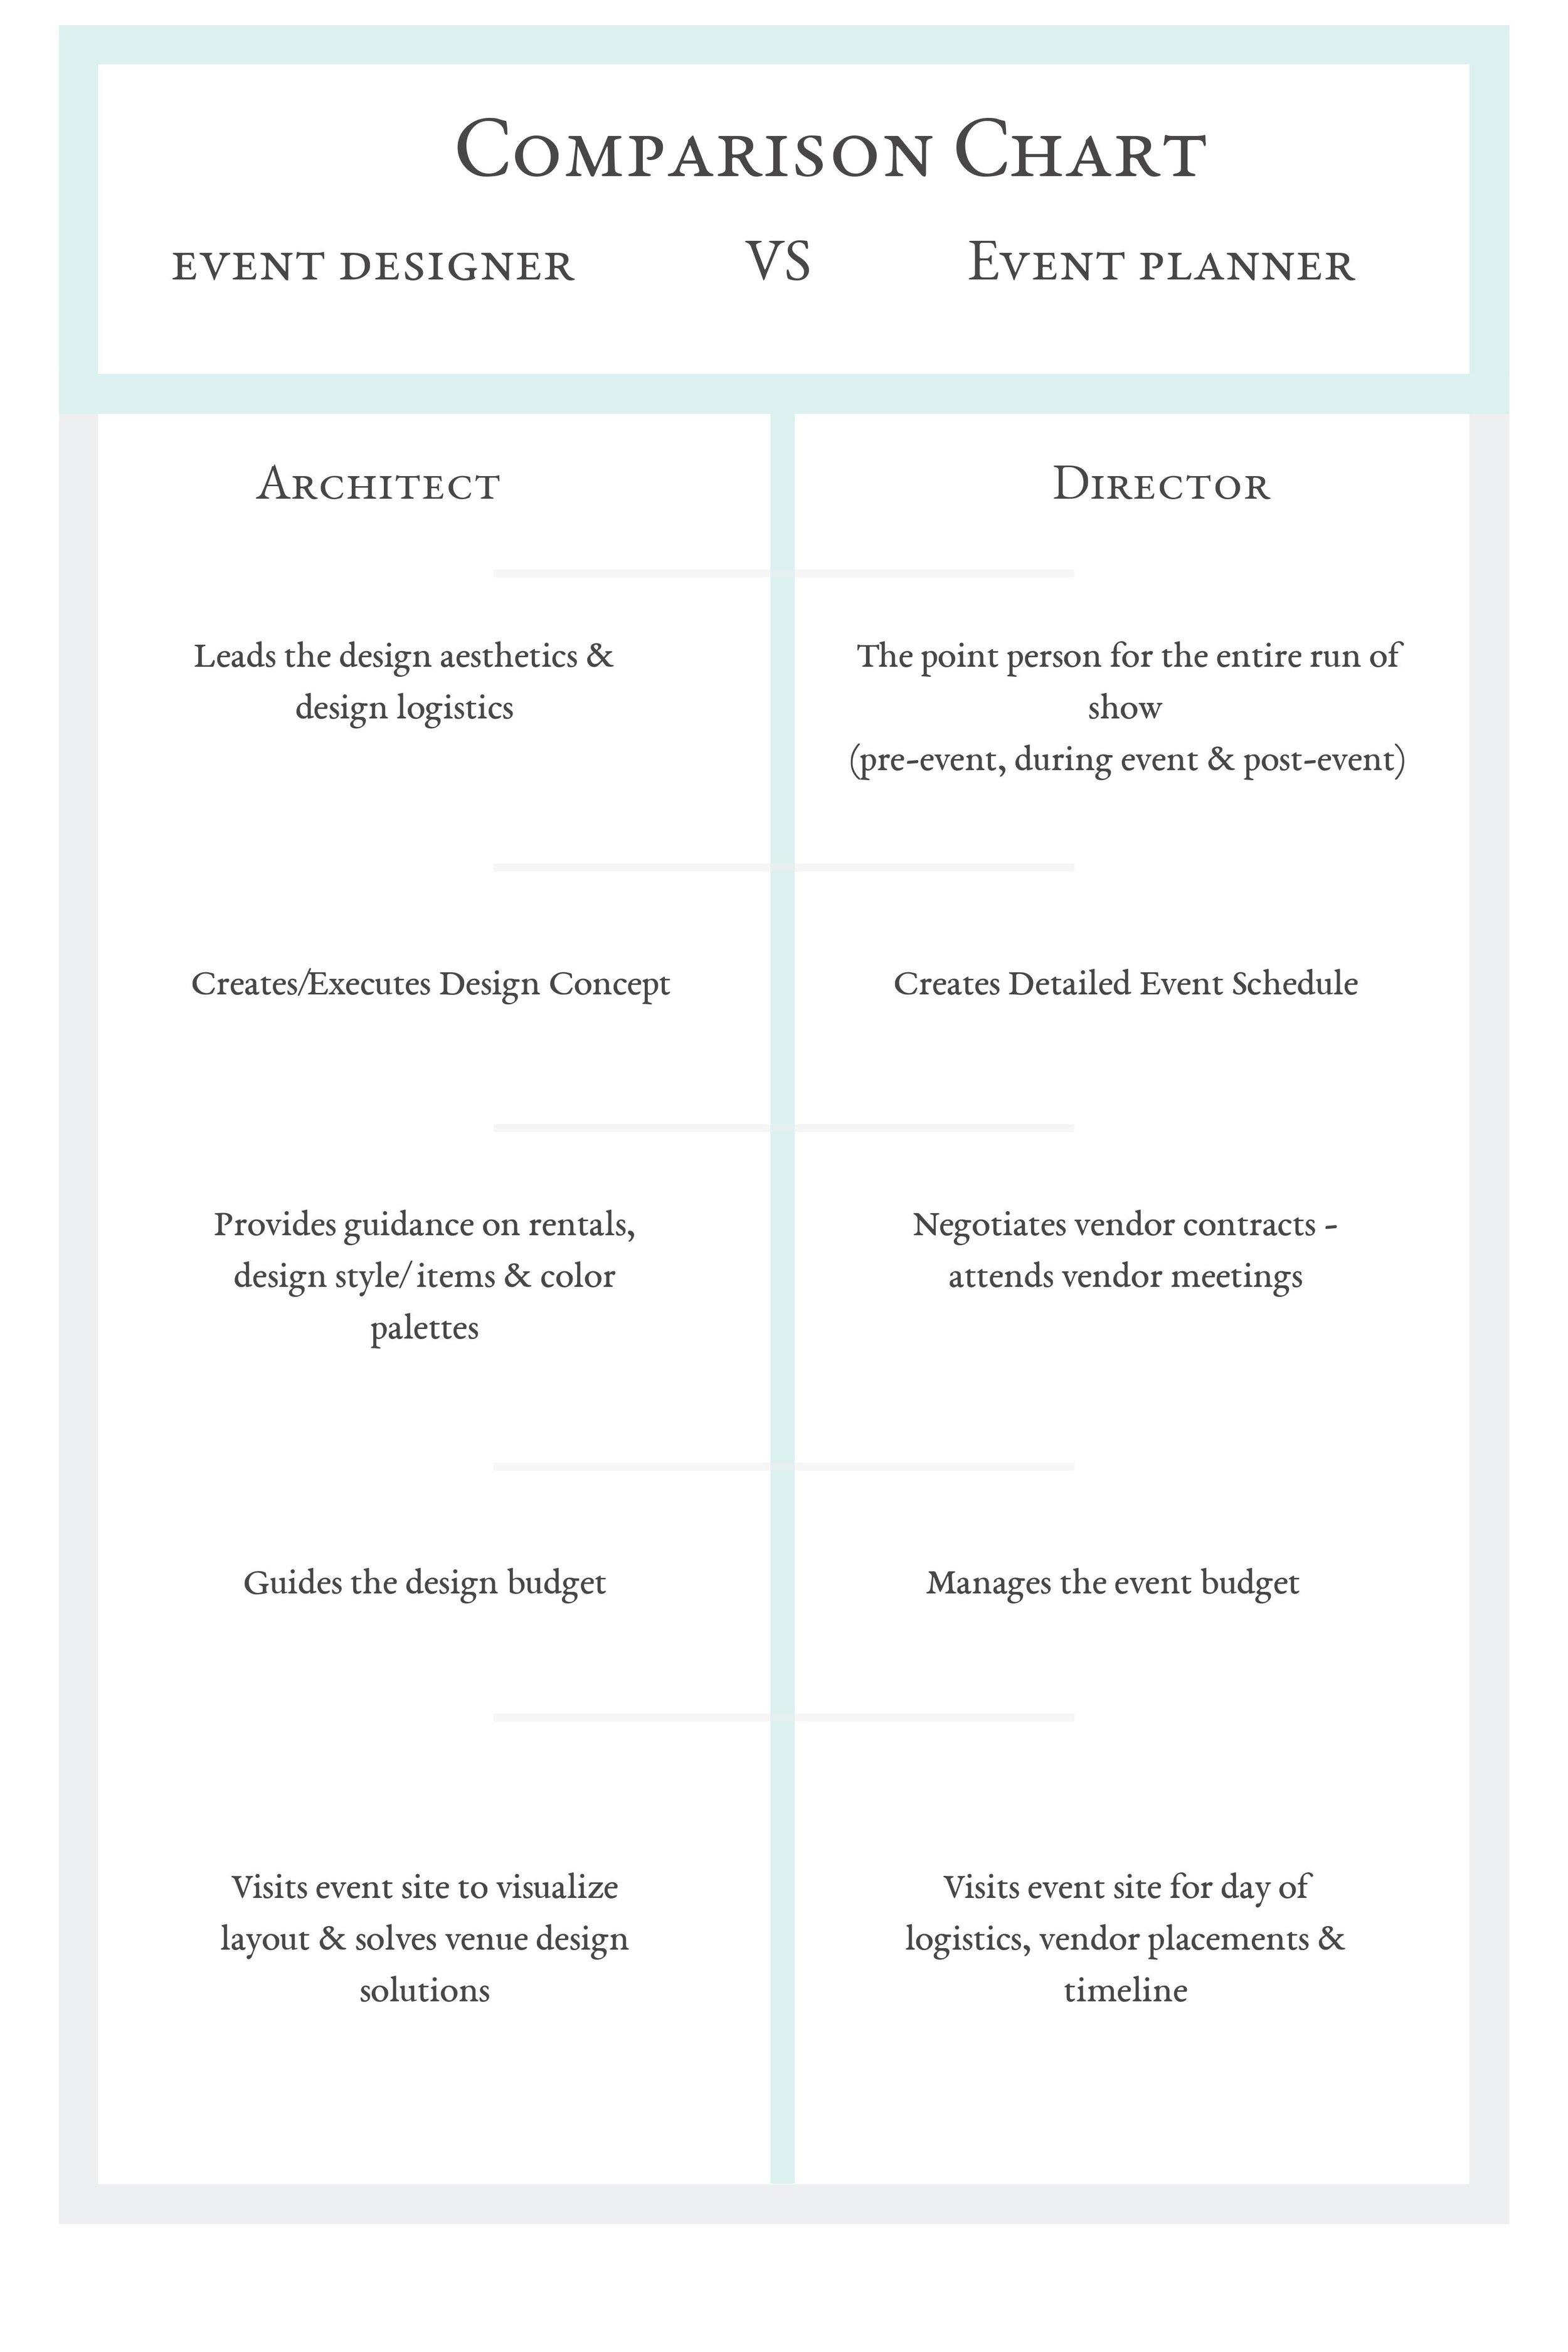 comparing event designer & event planner.jpg